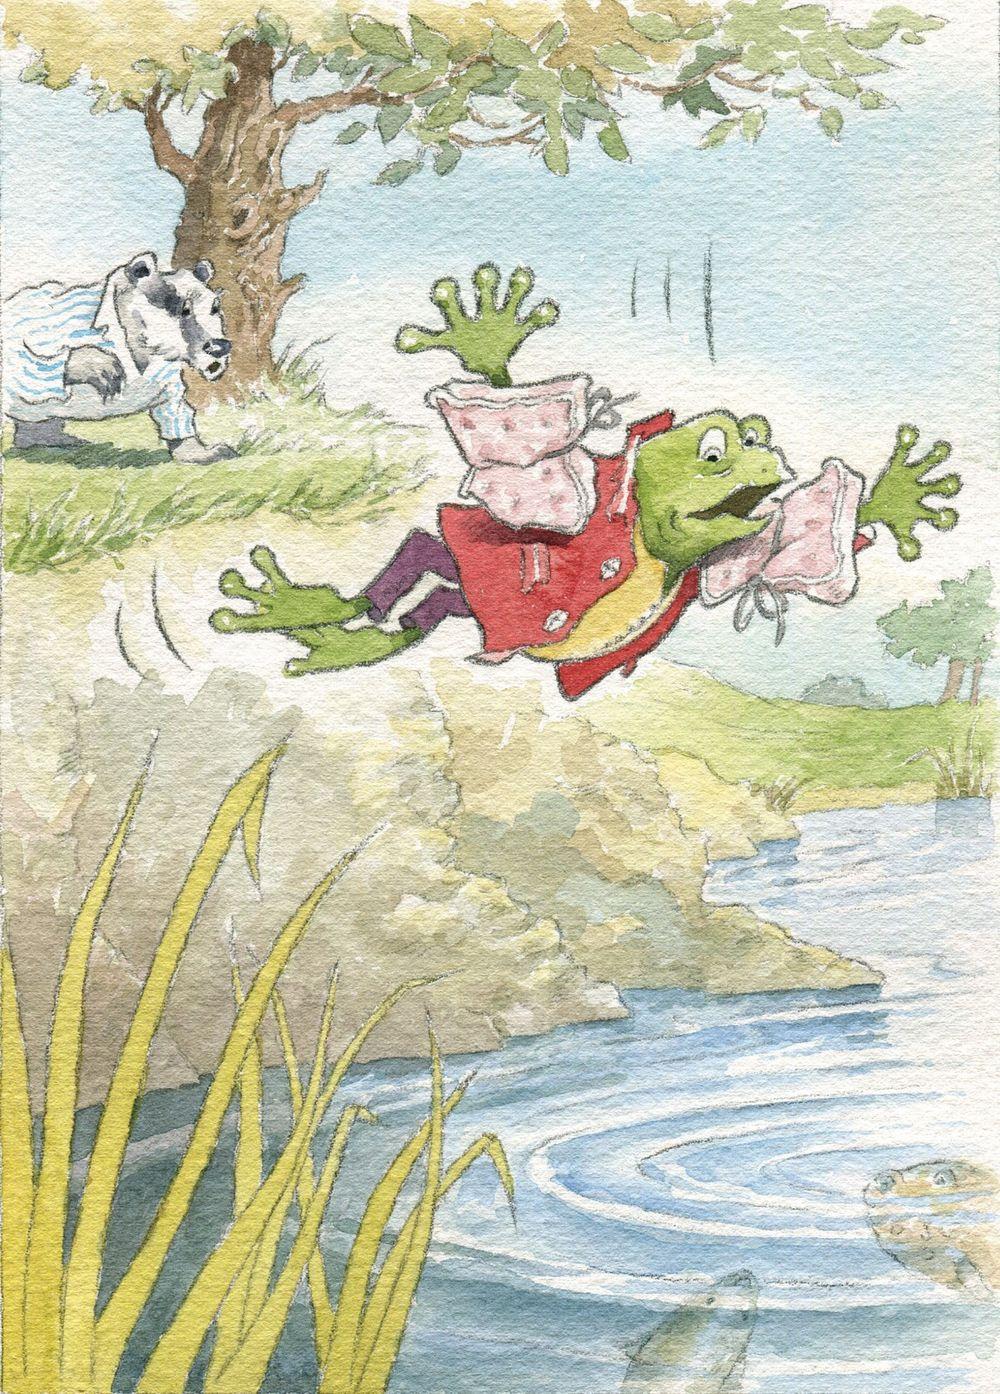 watercolourillustration_sallybarton_childrensfiction_FrogStory